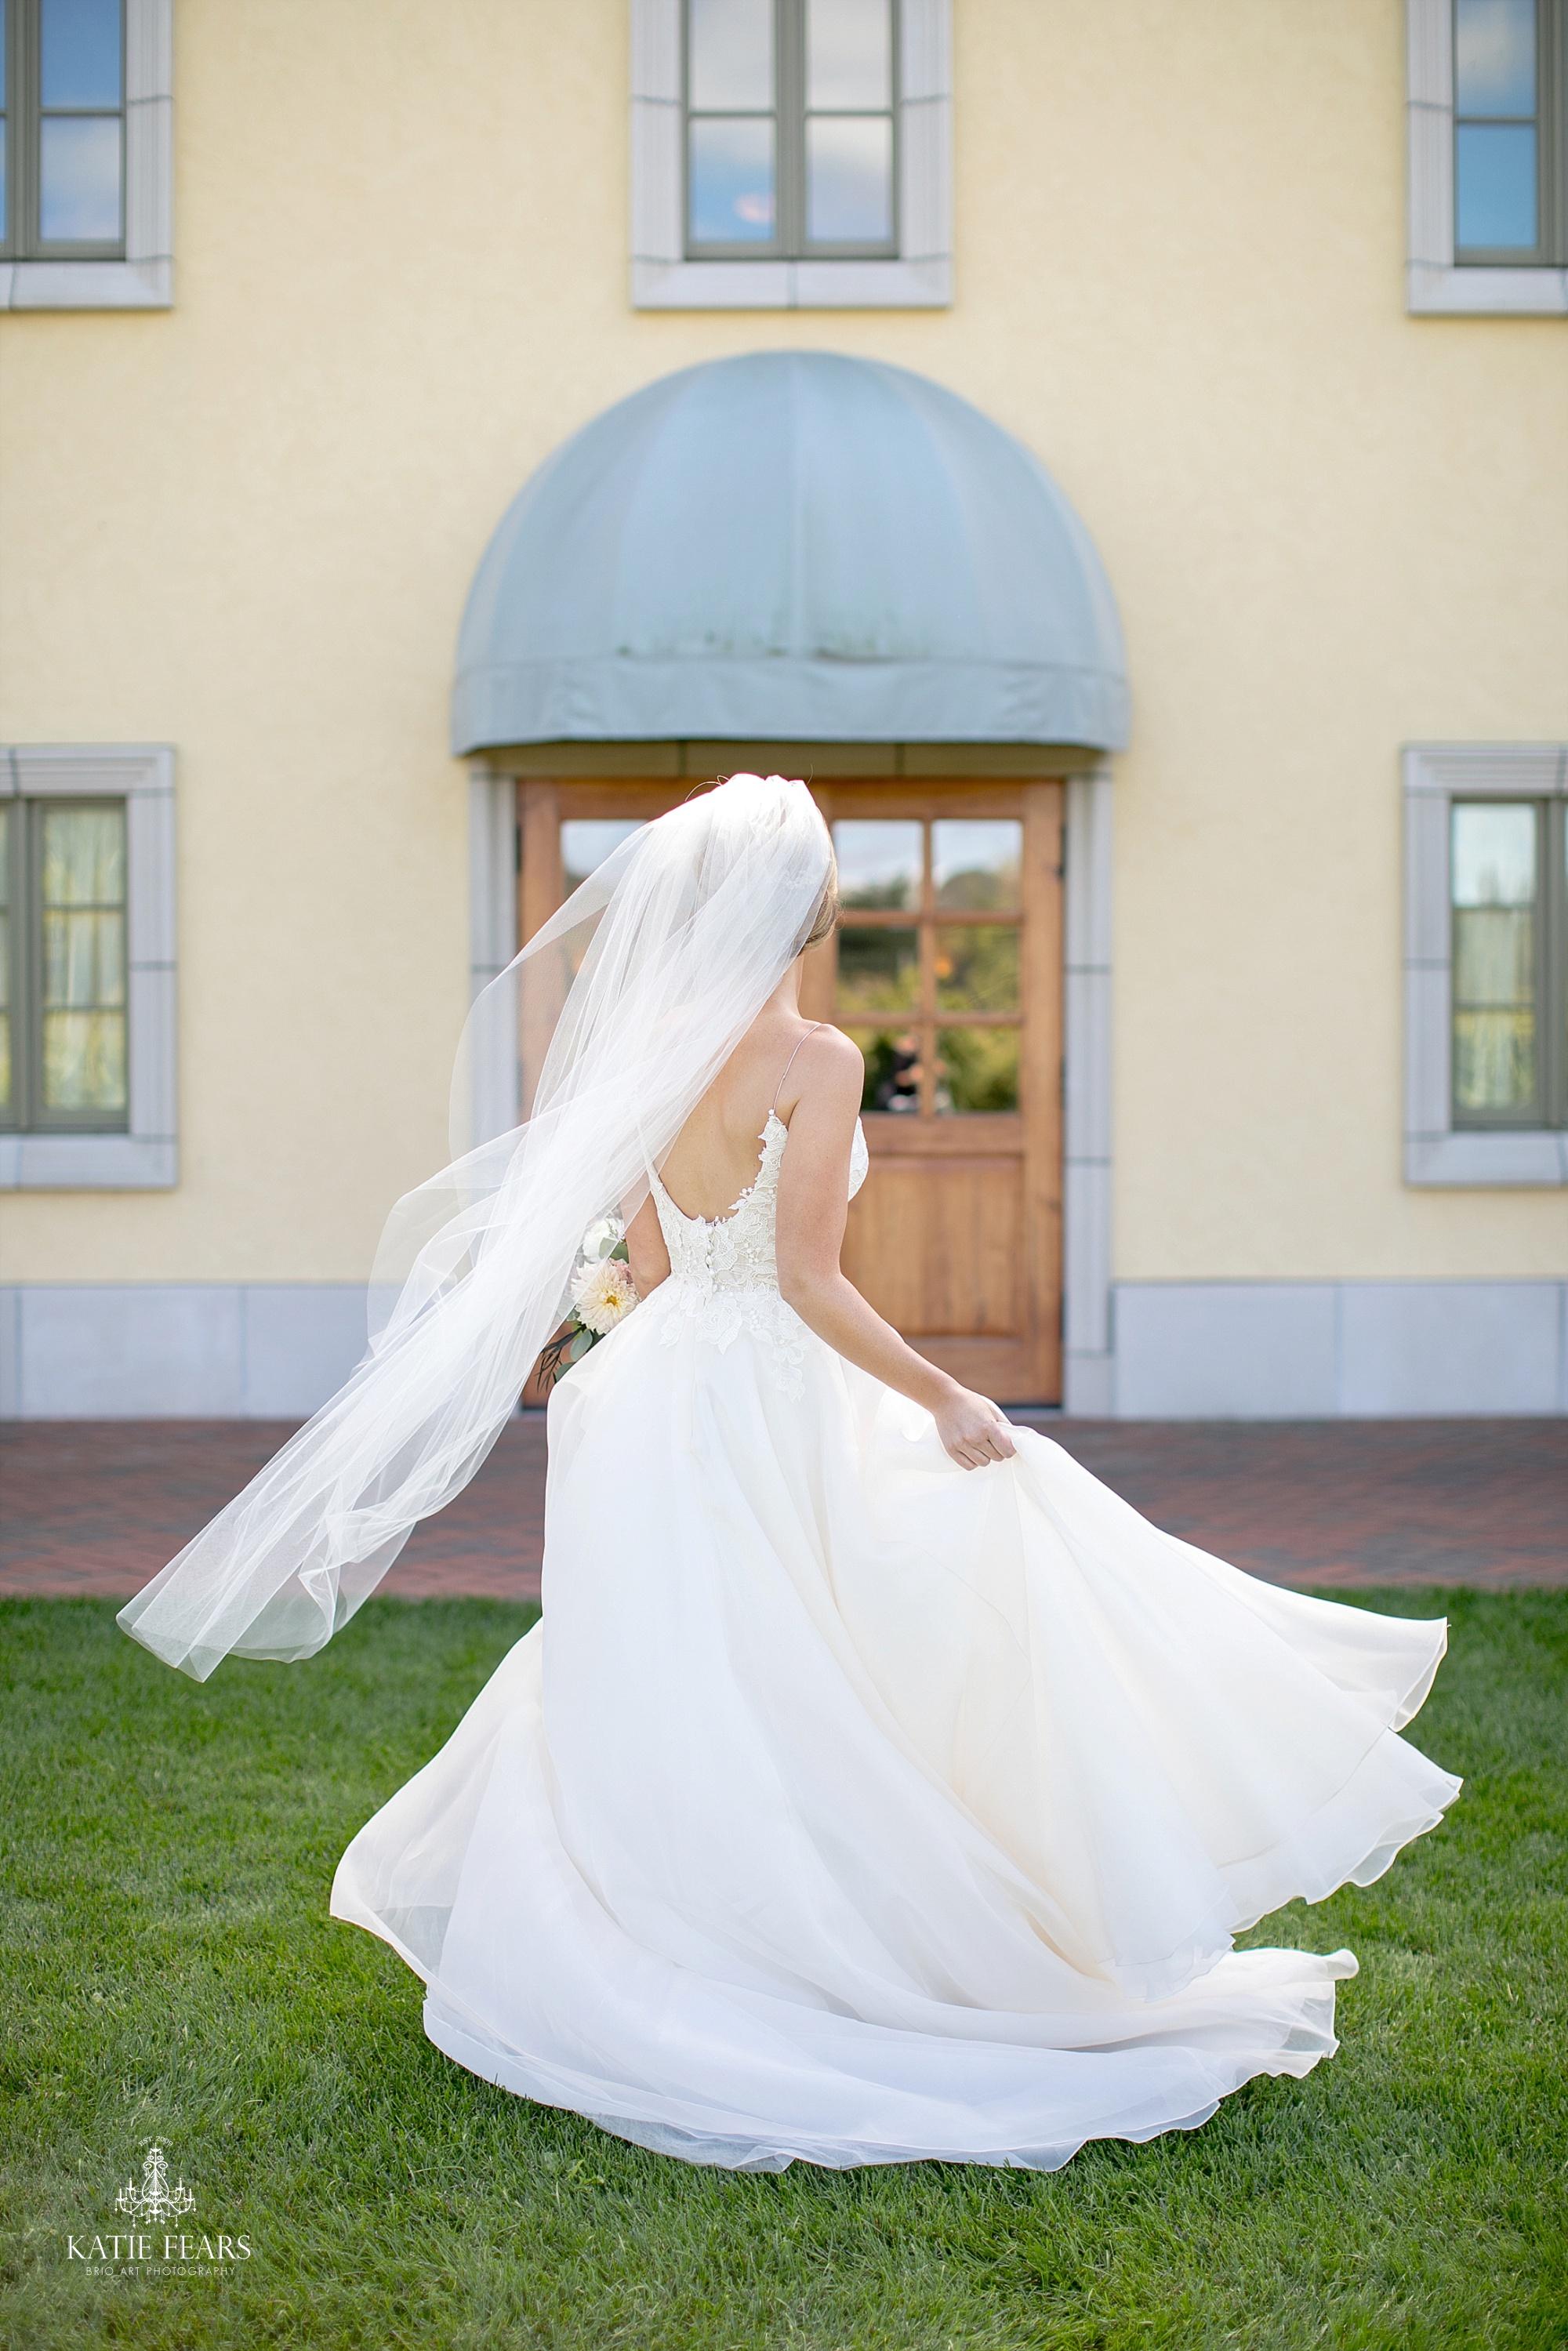 Best MN Wedding Photographer Katie Fears   www.brioart.com